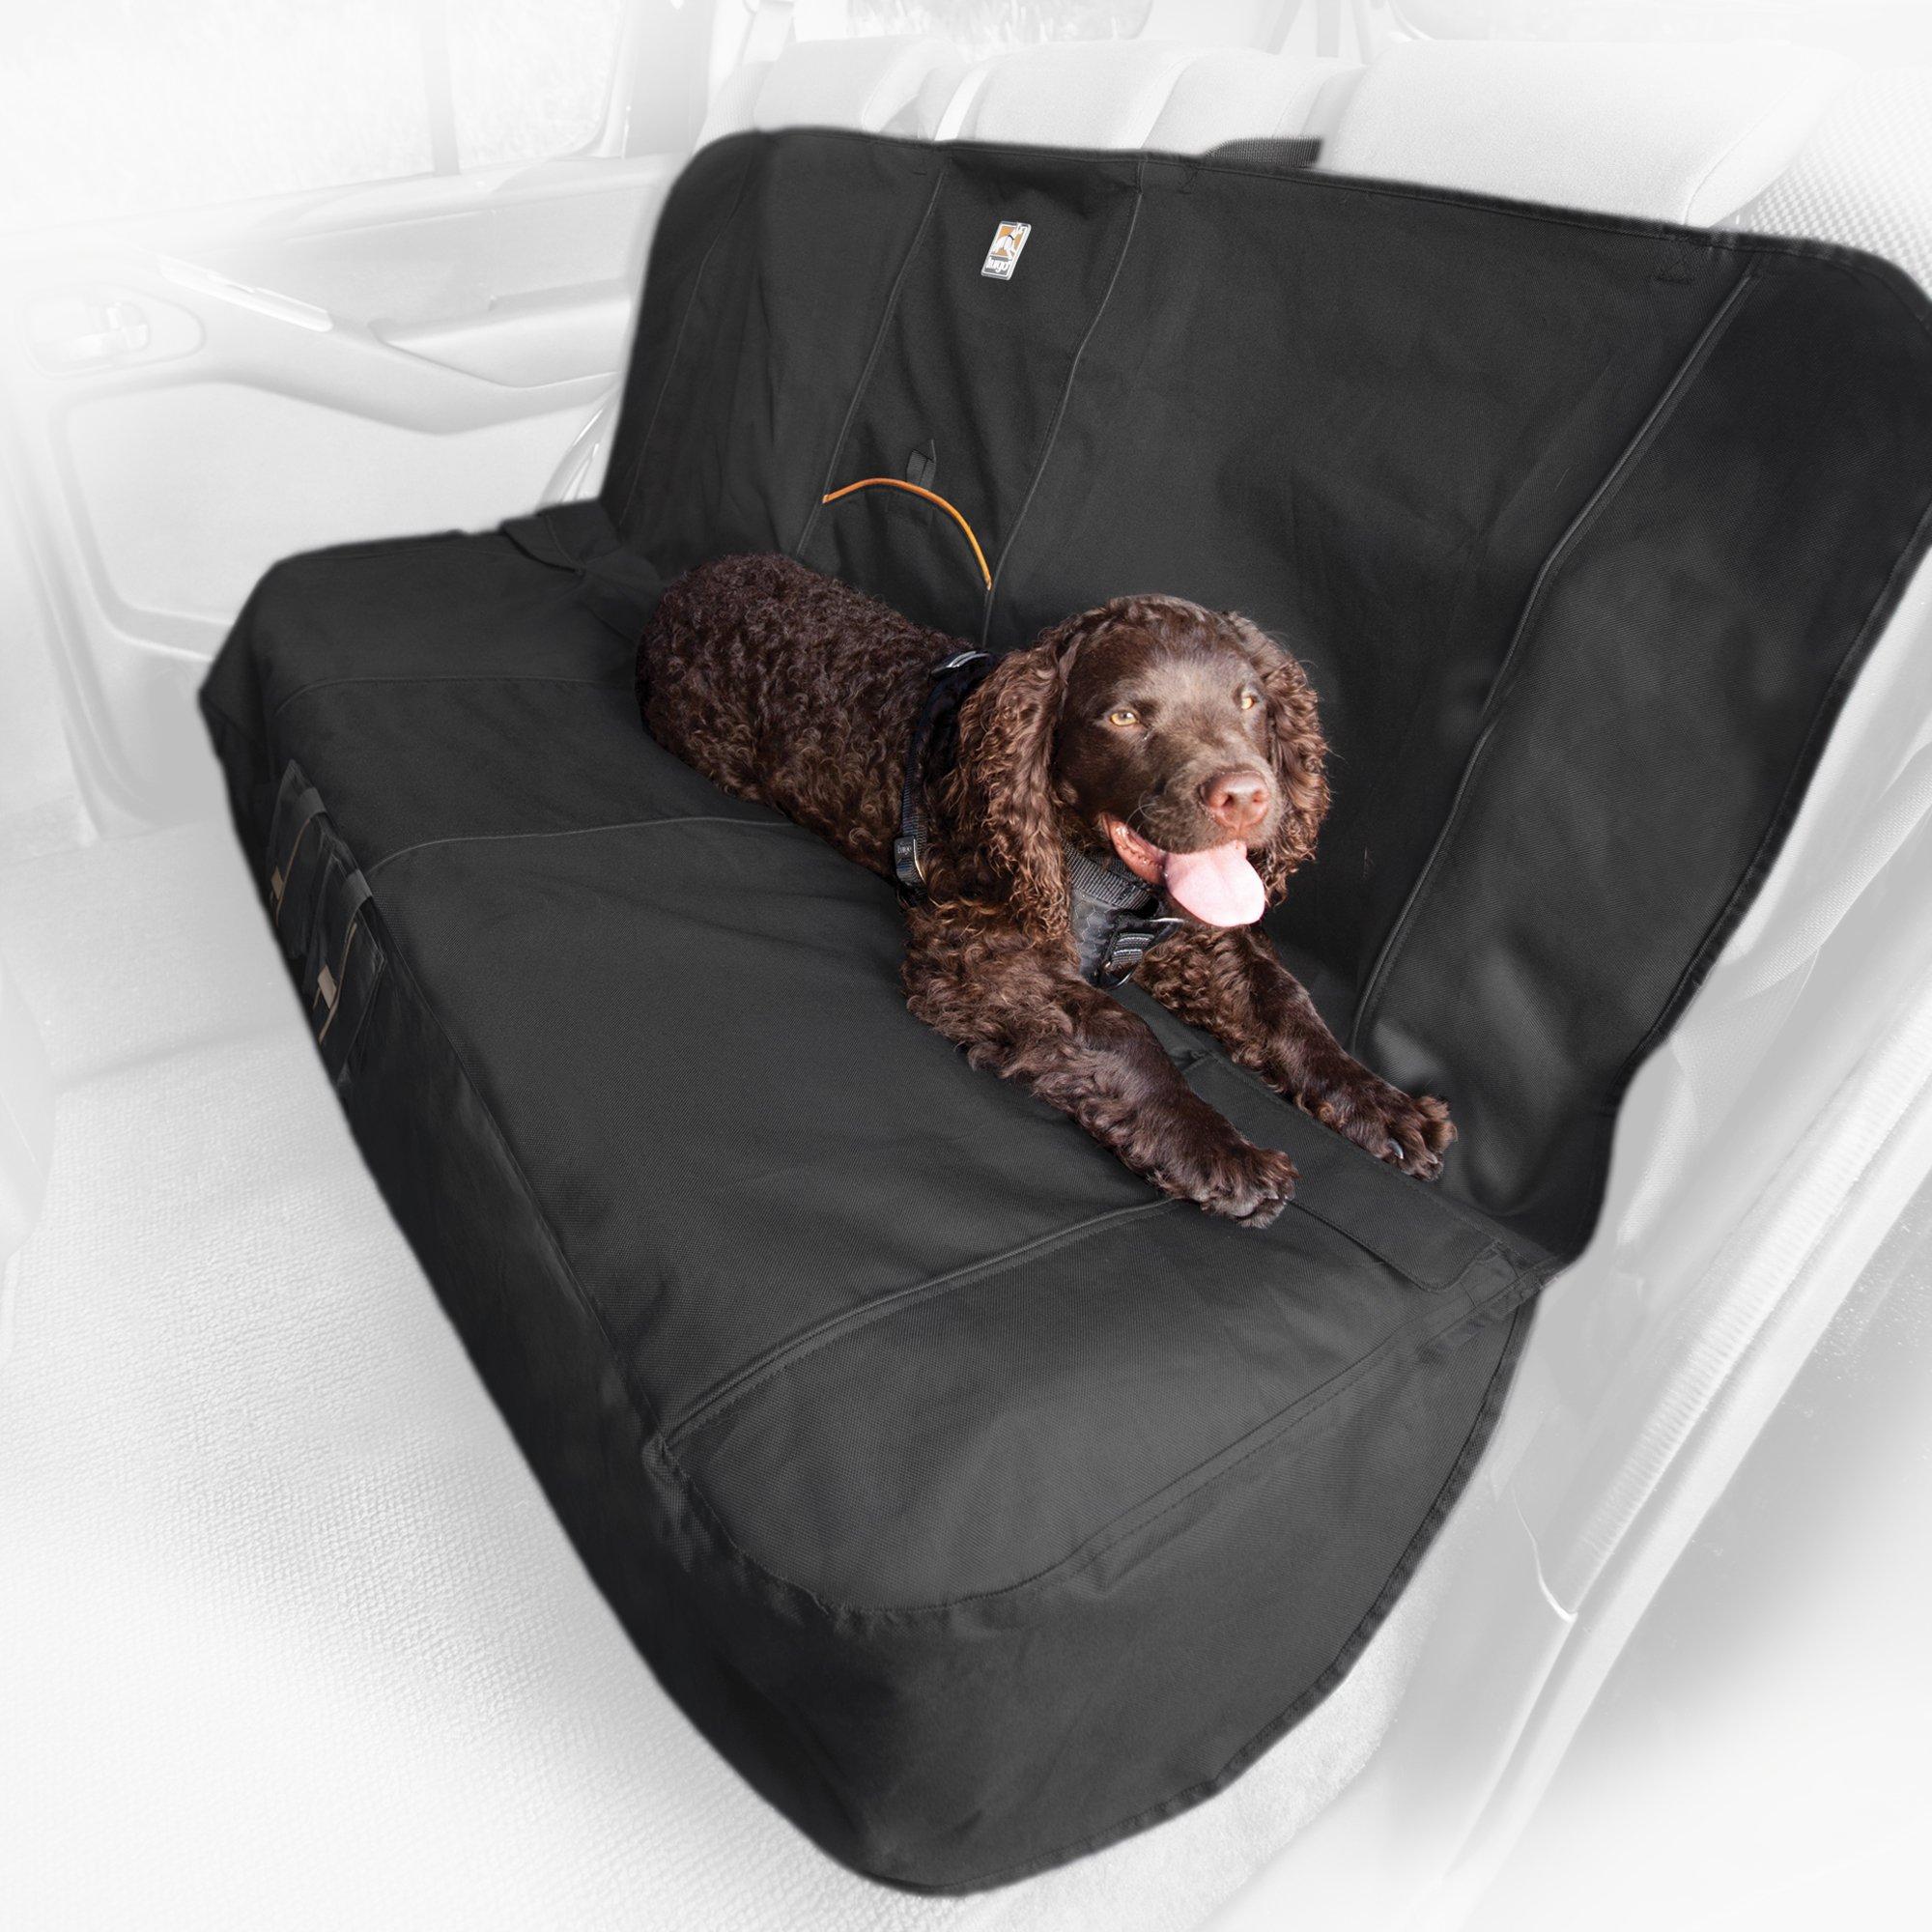 NEW Pet Dog Car Bench Seat Cover, Waterproof Machine